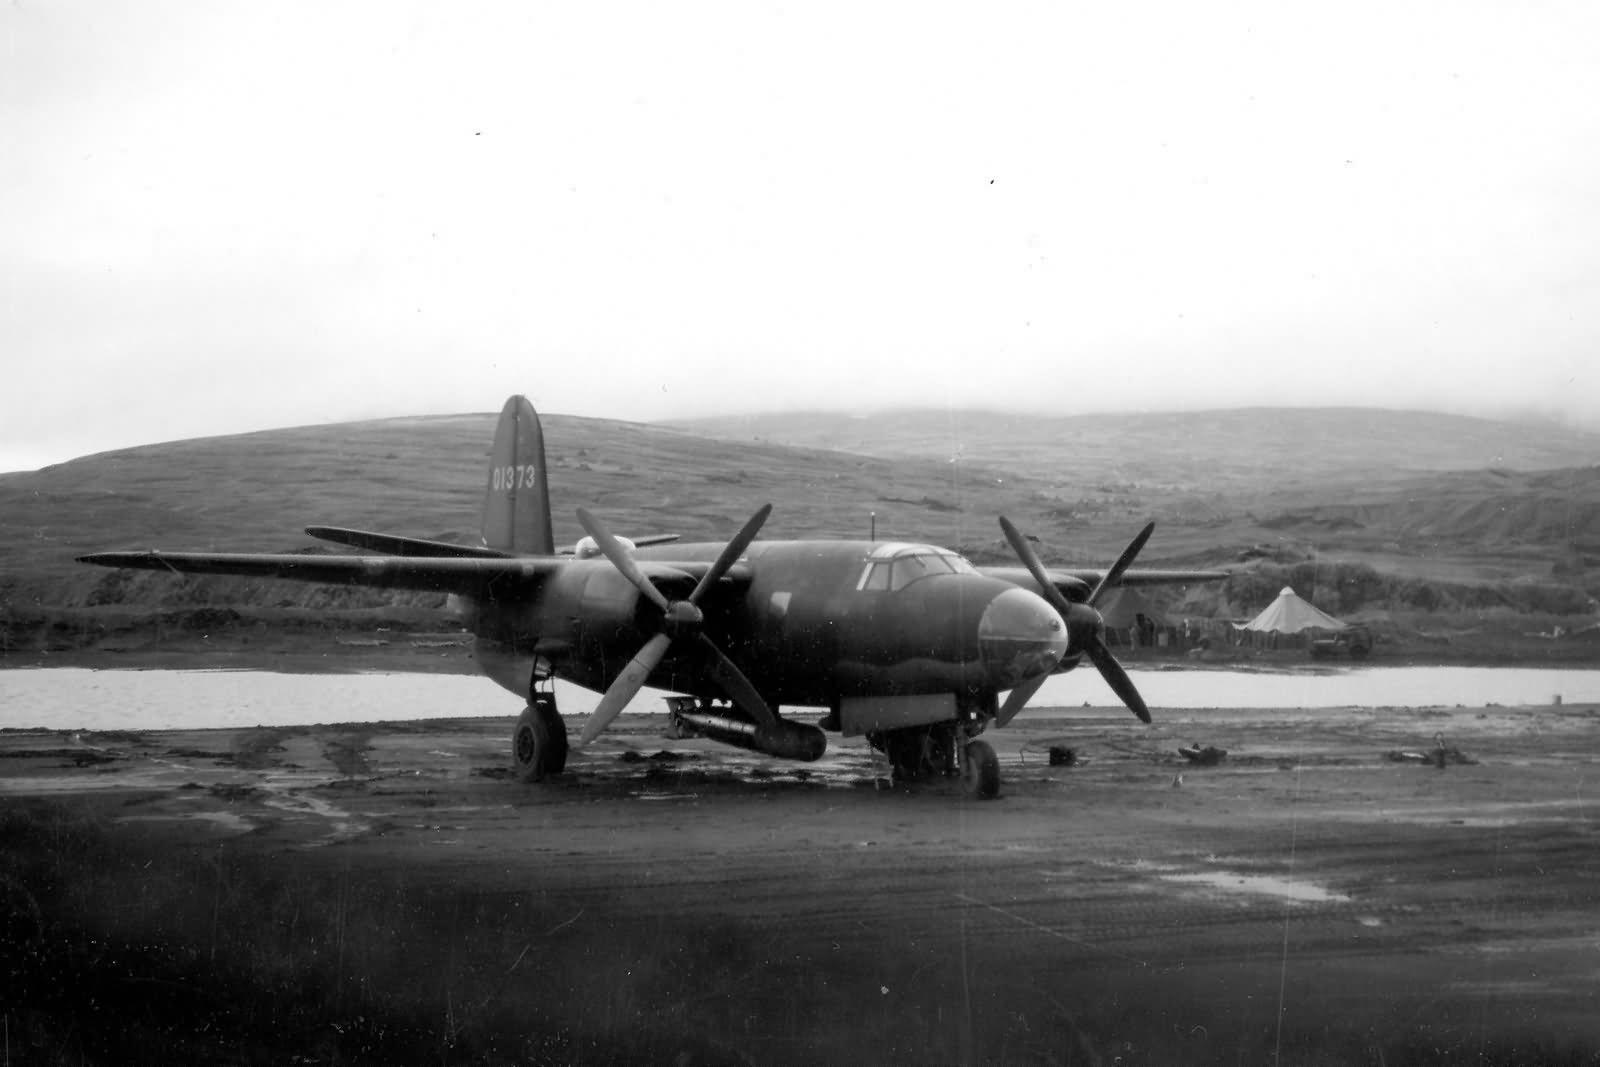 B-26 Marauder 40-1373 of 77th Bomb Squadron Adak Island in the Aleutians November 1942